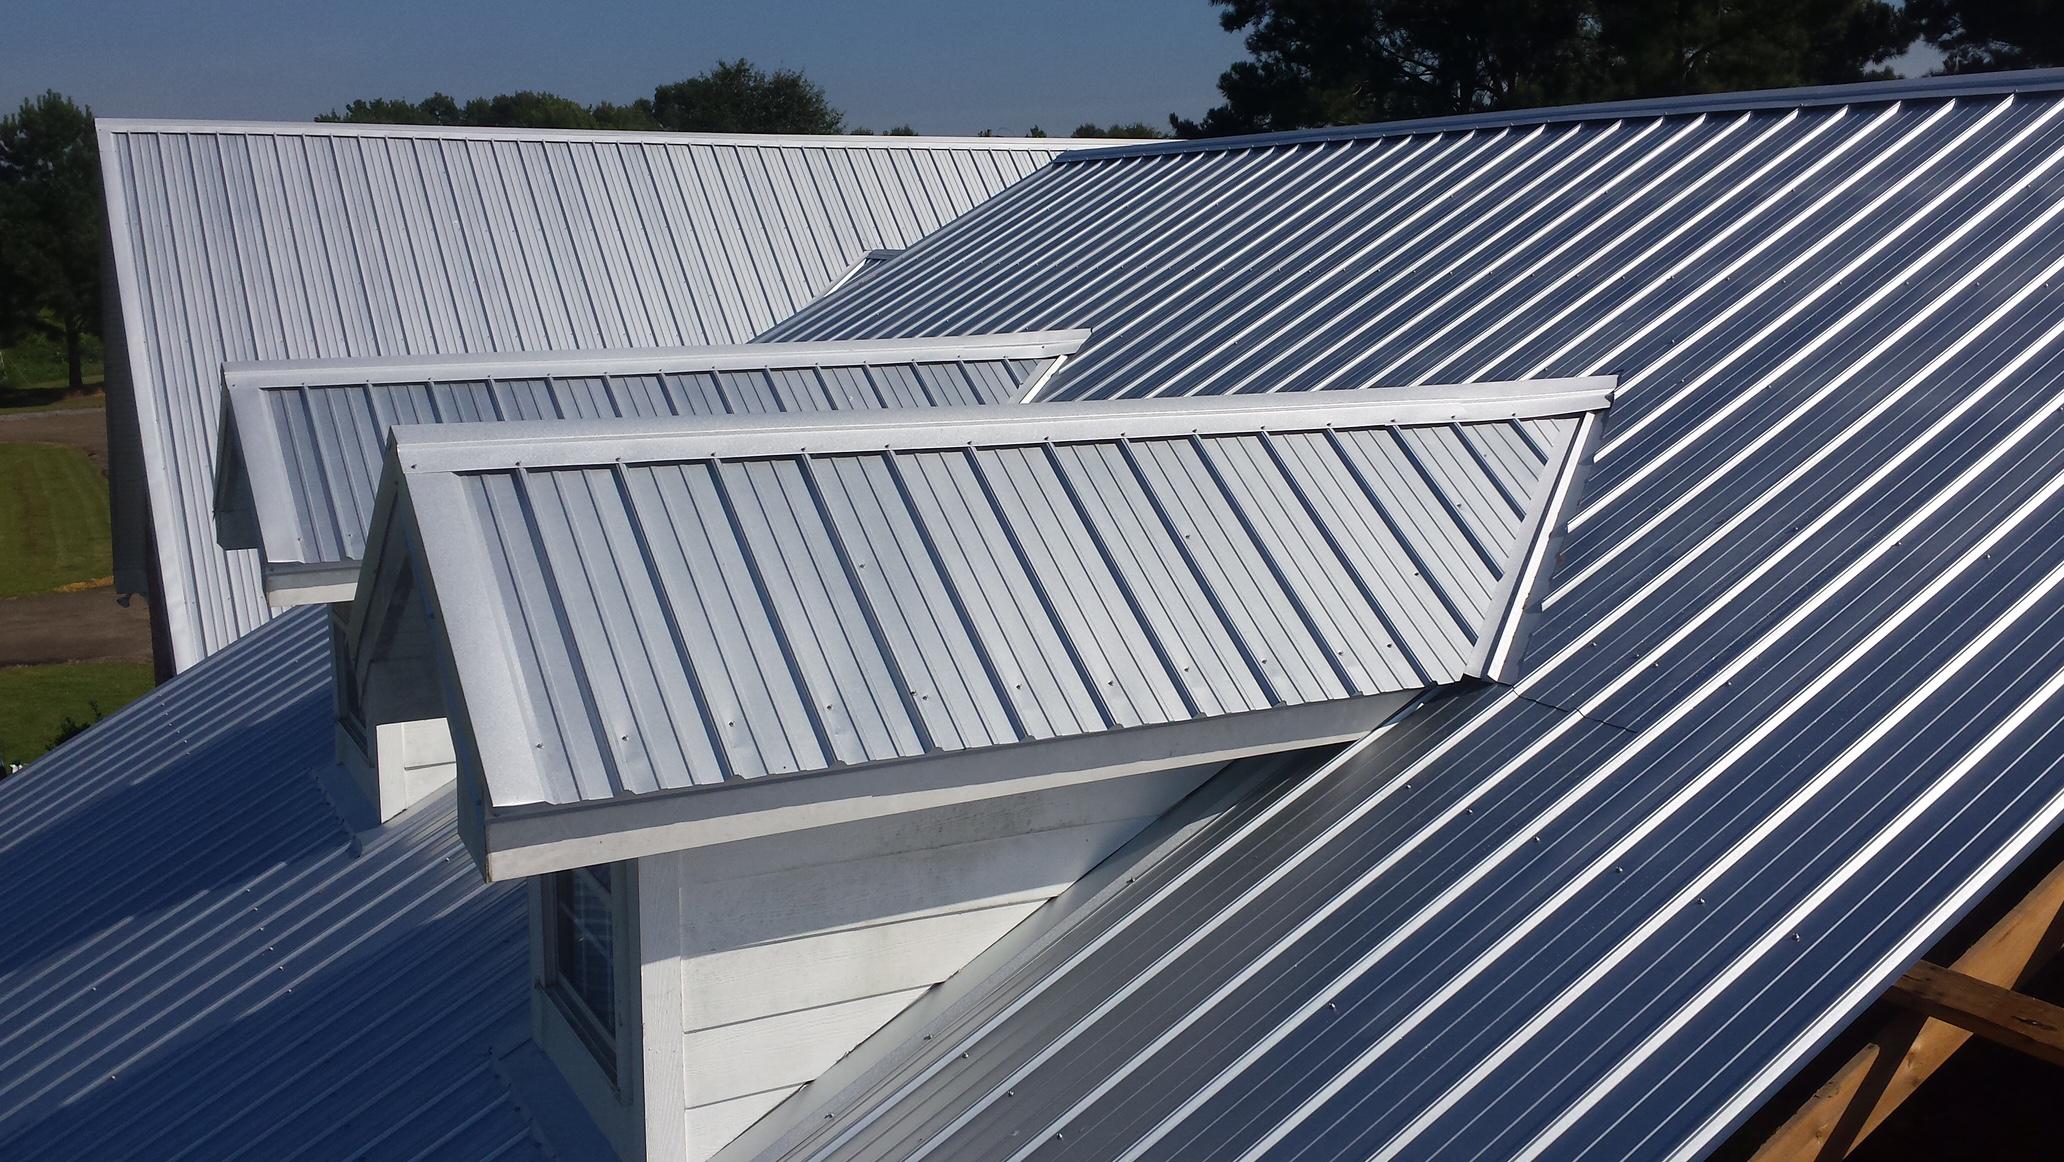 Ce tip de acoperis sa alegem pentru casa? Tigla ceramica sau tabla?